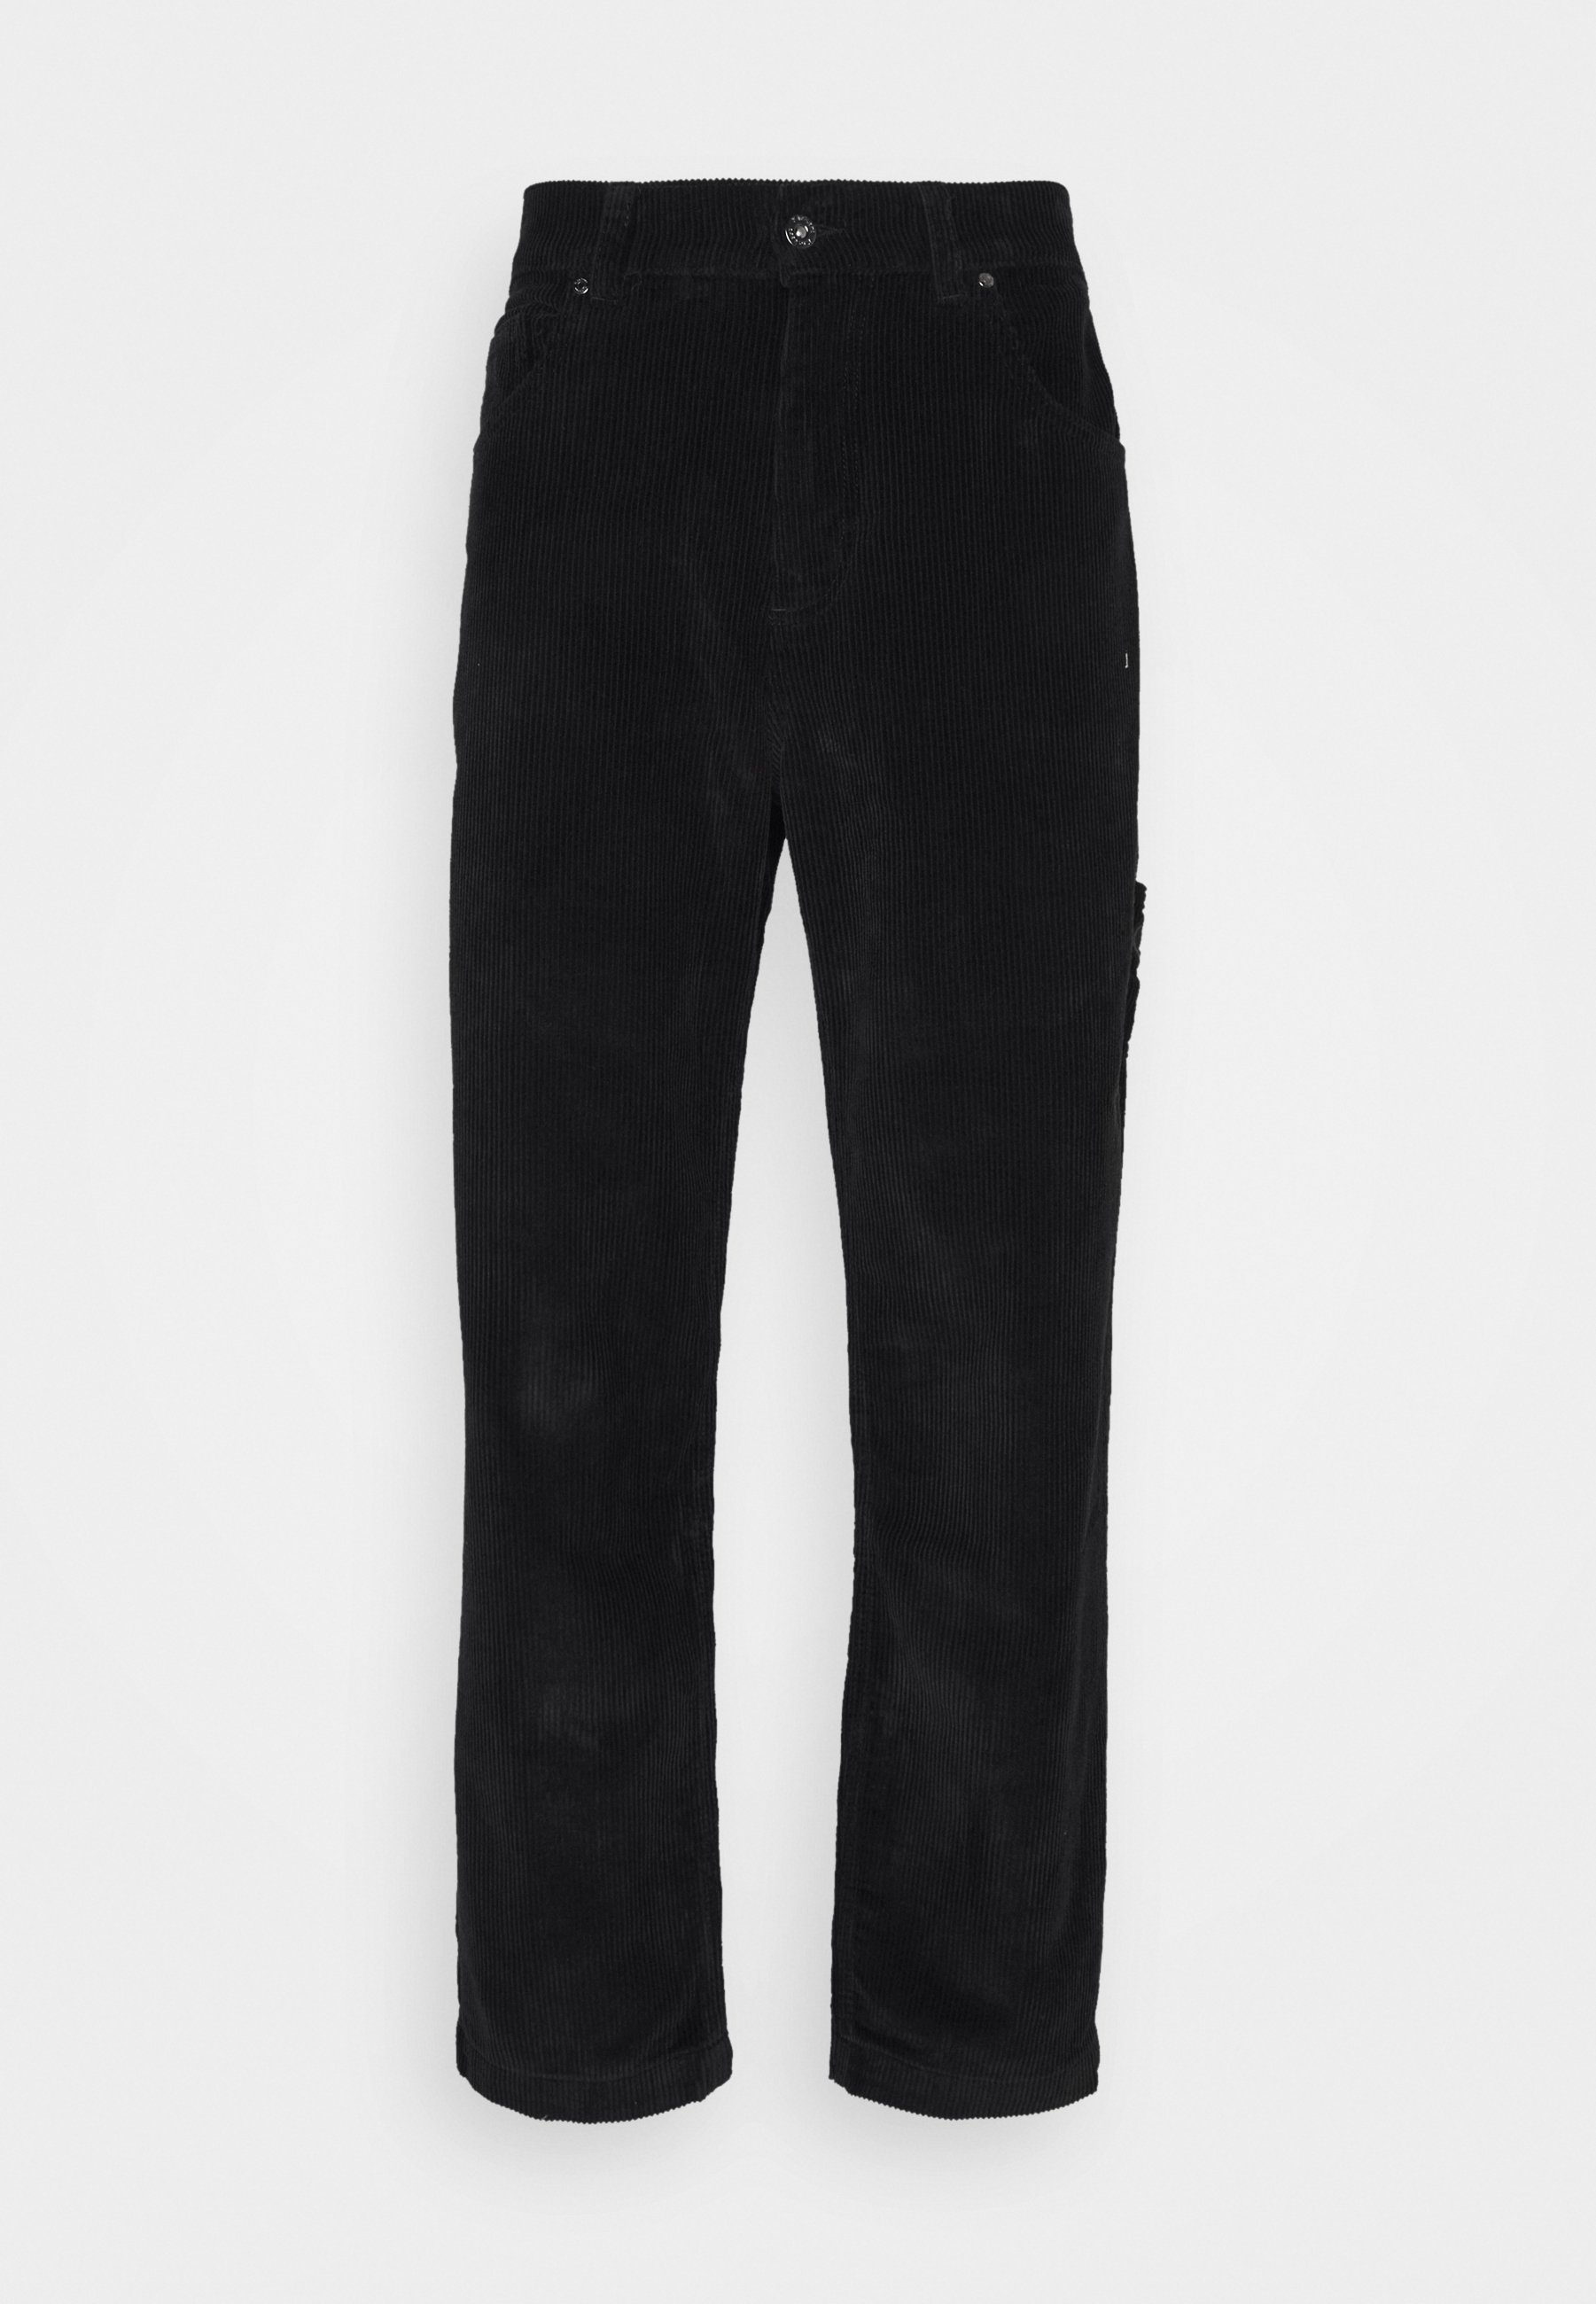 Kickers Classics Carpenter Trouser - Bukse Black/svart